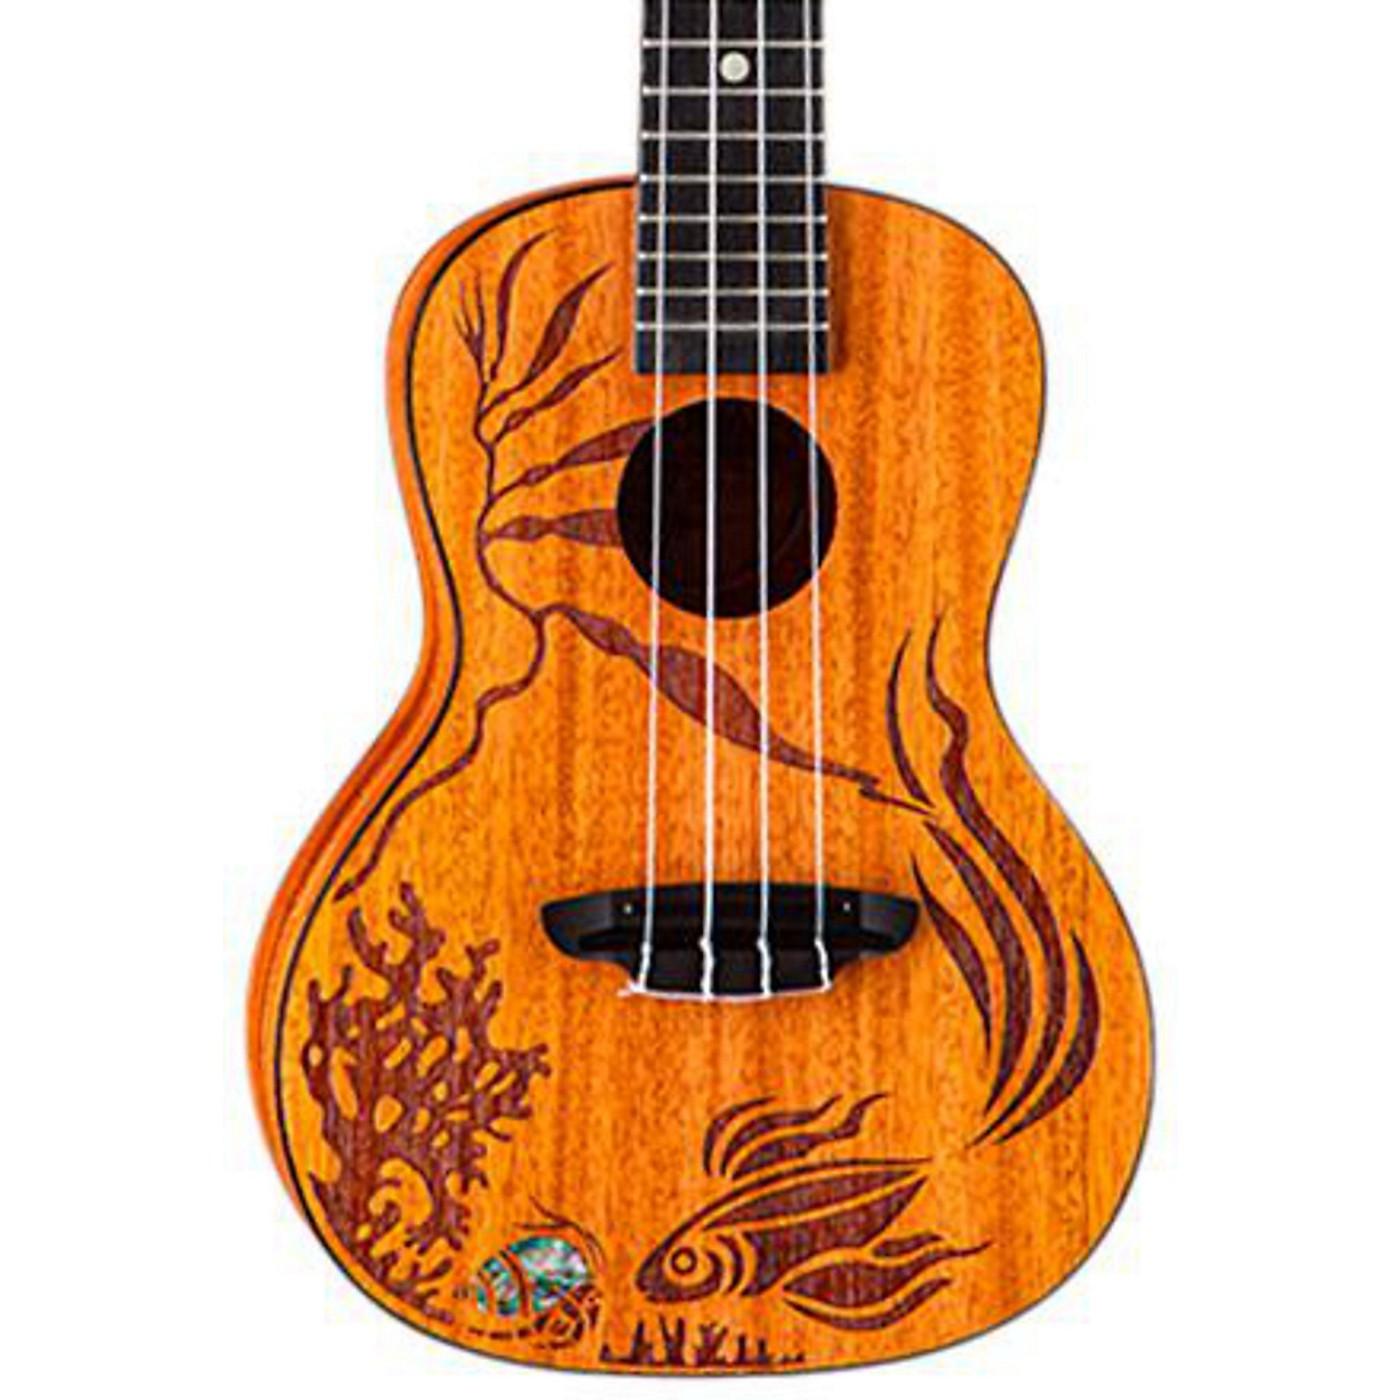 Luna Guitars Coral Solid Mahogany Concert Ukulele thumbnail